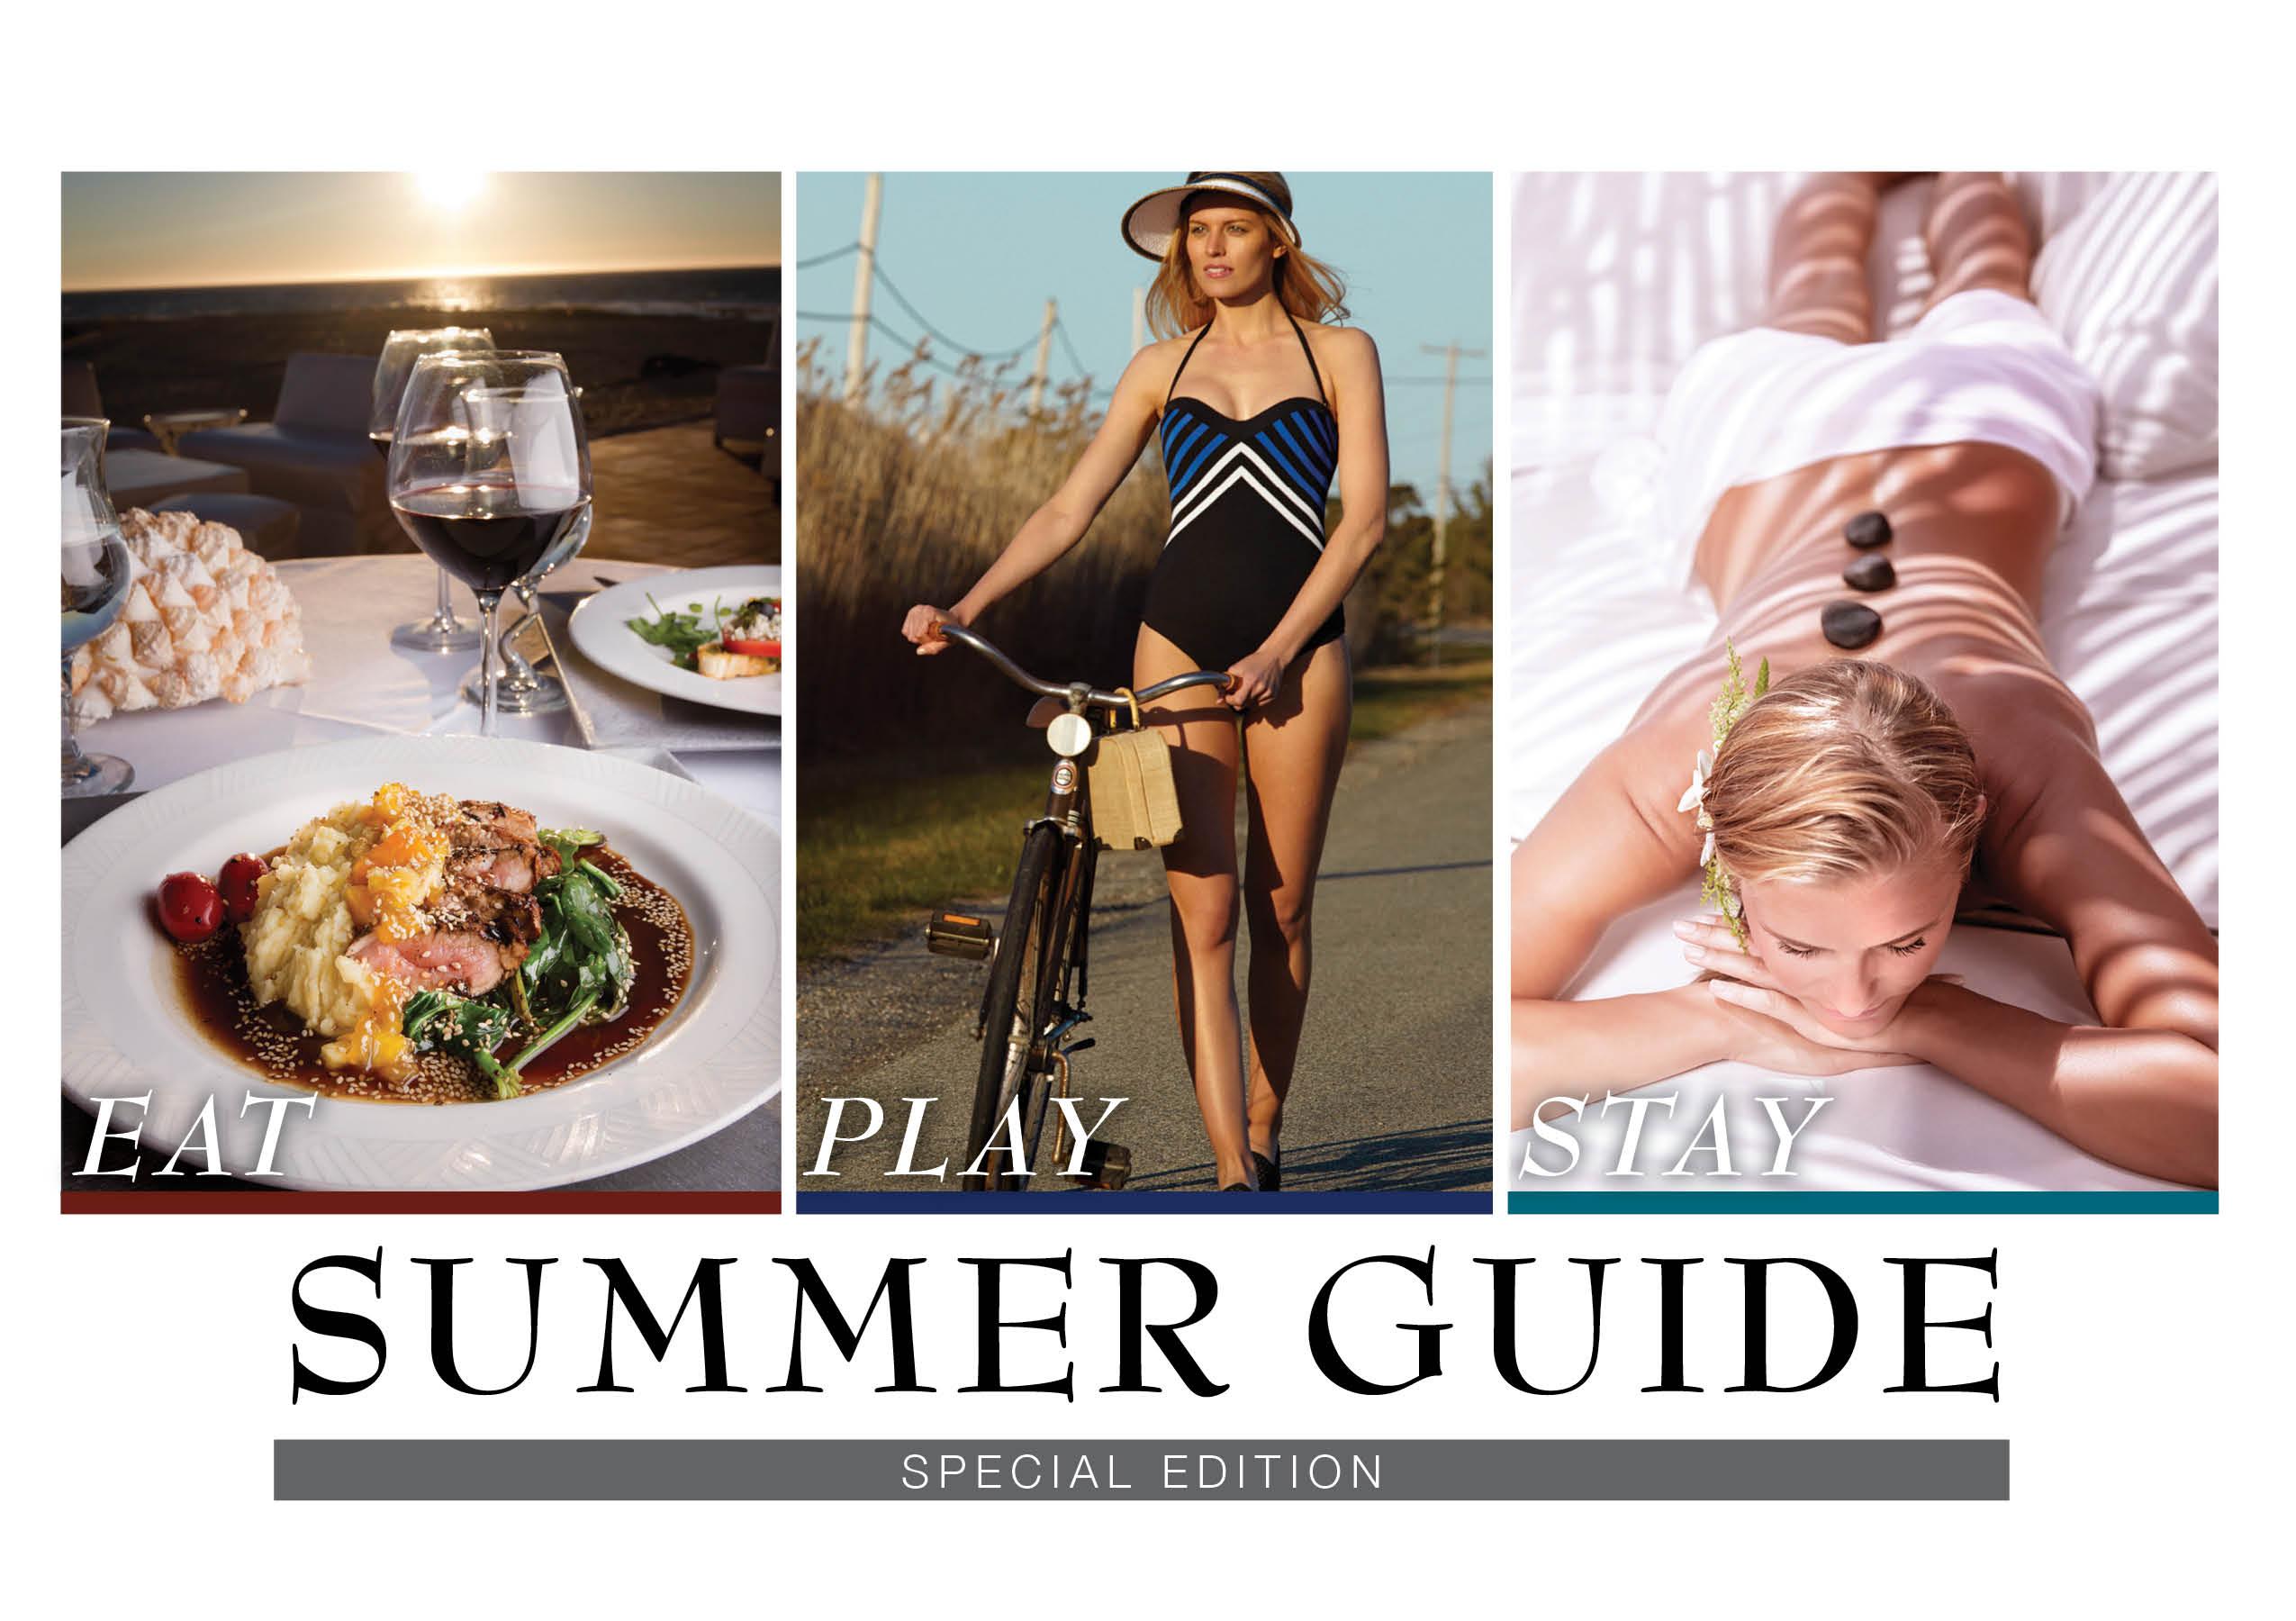 SummerGuide